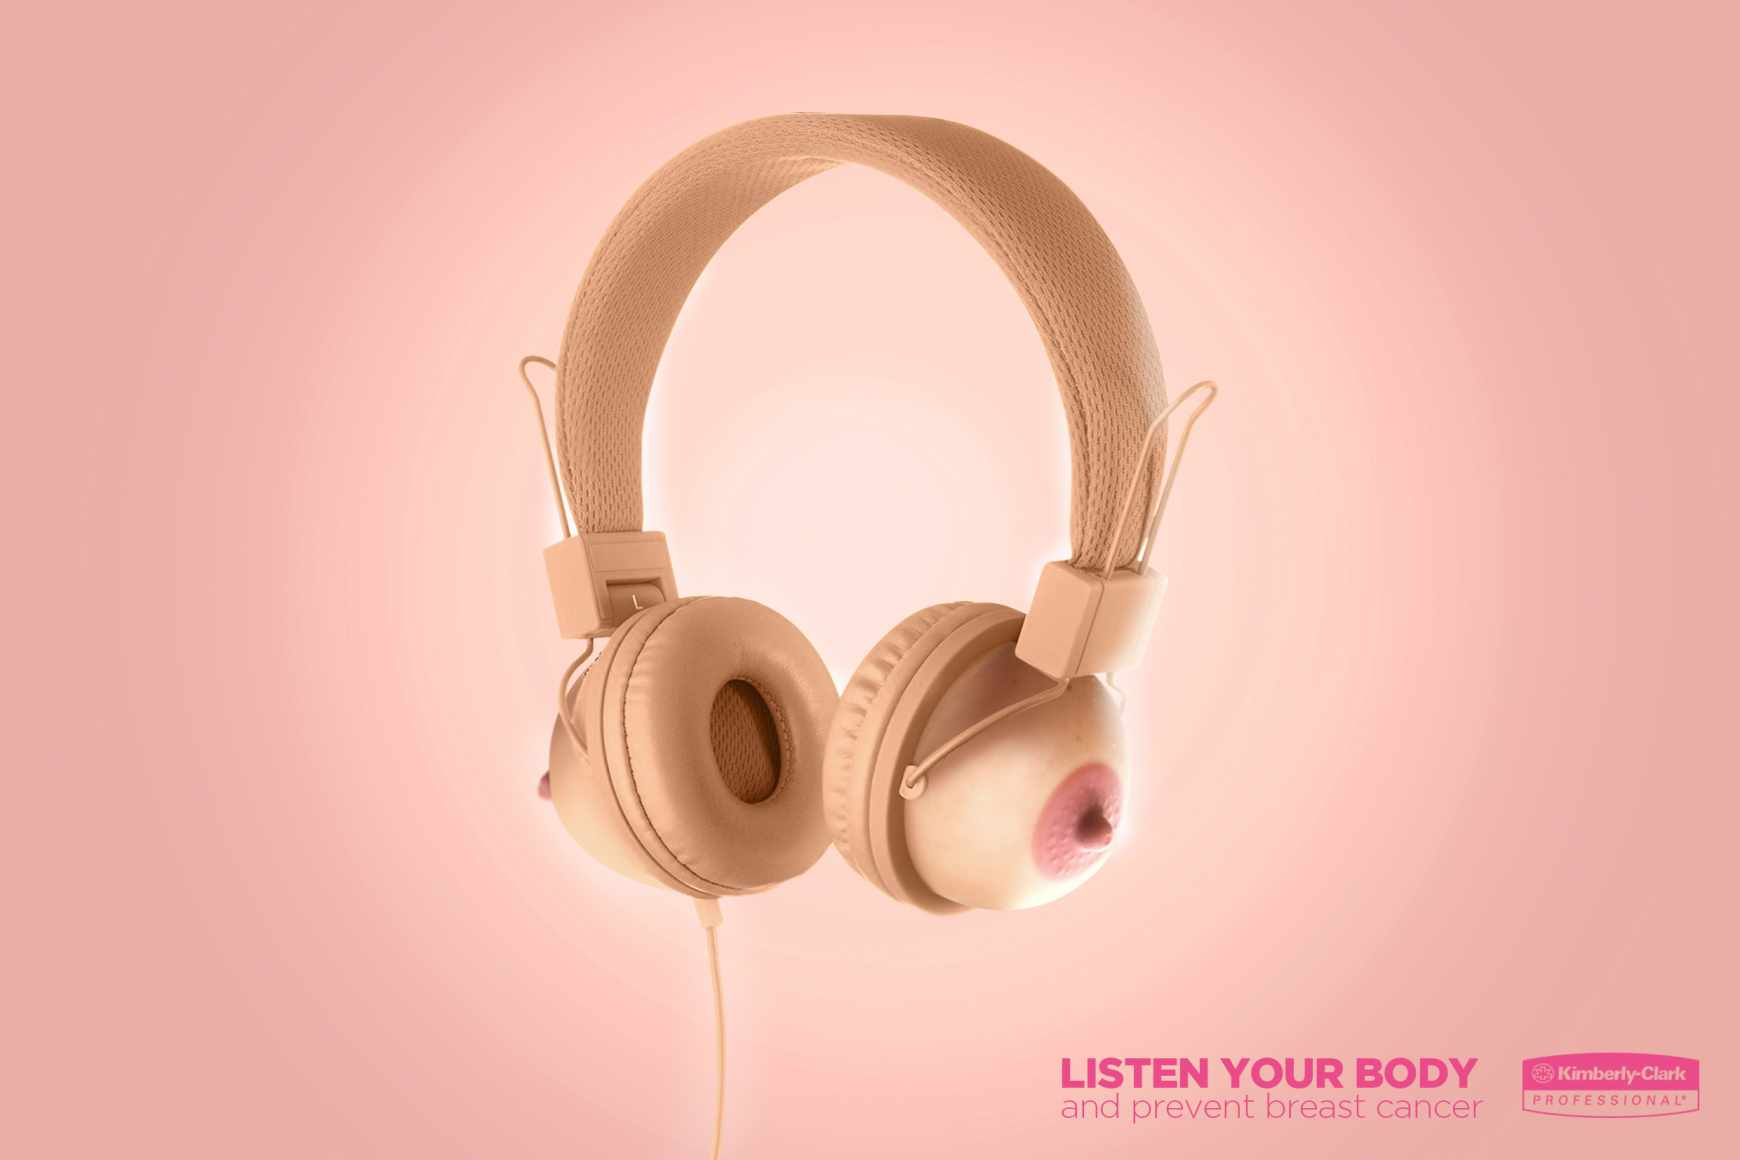 Kimberly-Clark Print Ad - Headphones